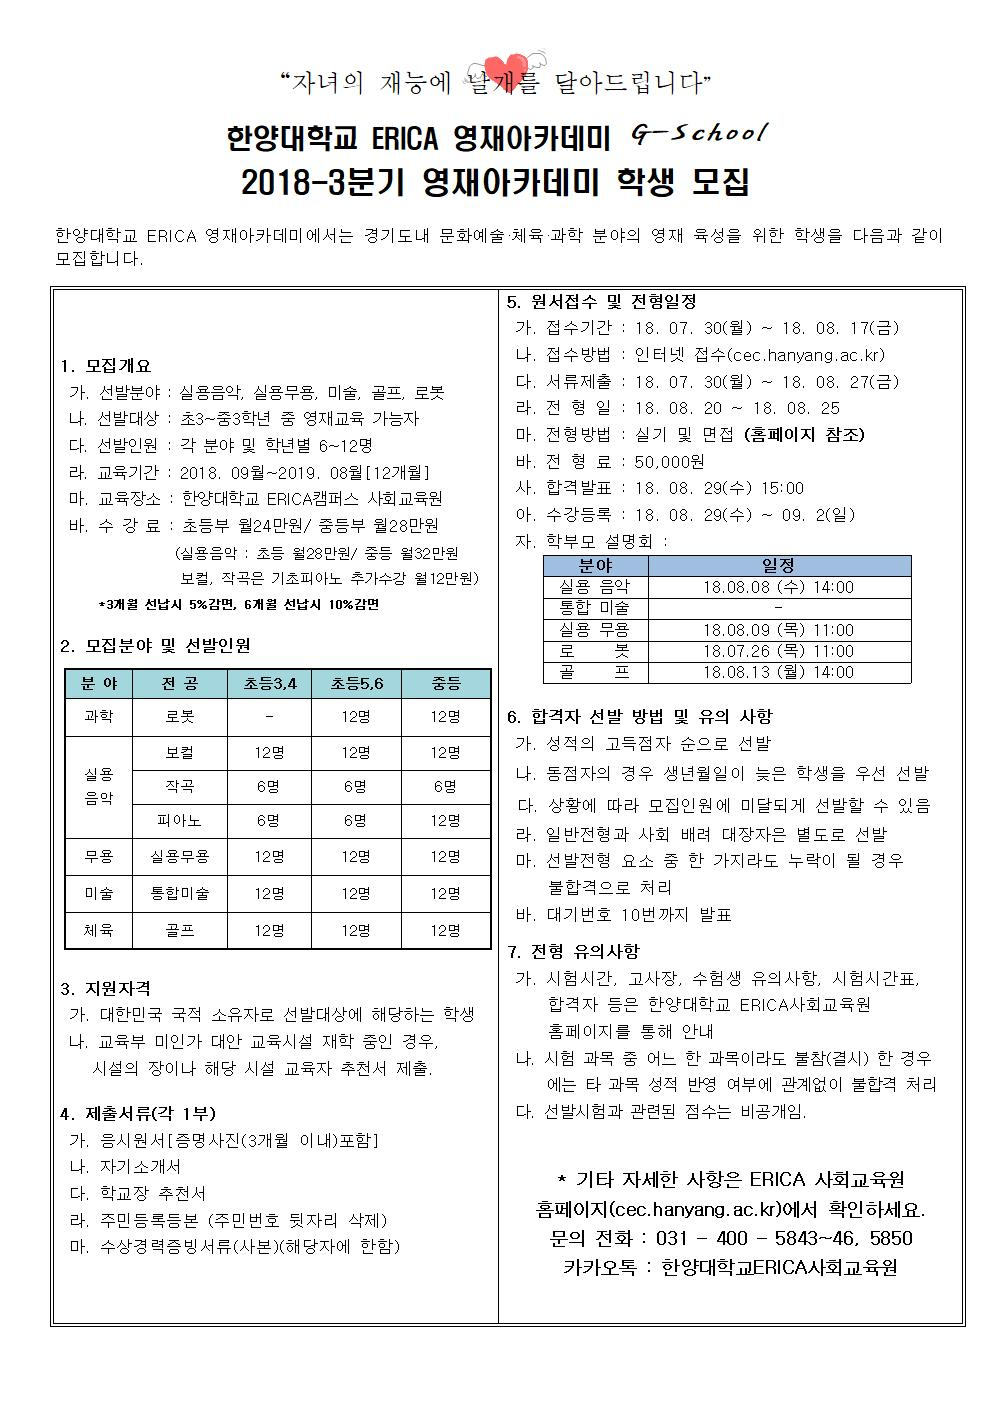 G.School 2018-3분기 요강 요약본 (1장)001.jpg